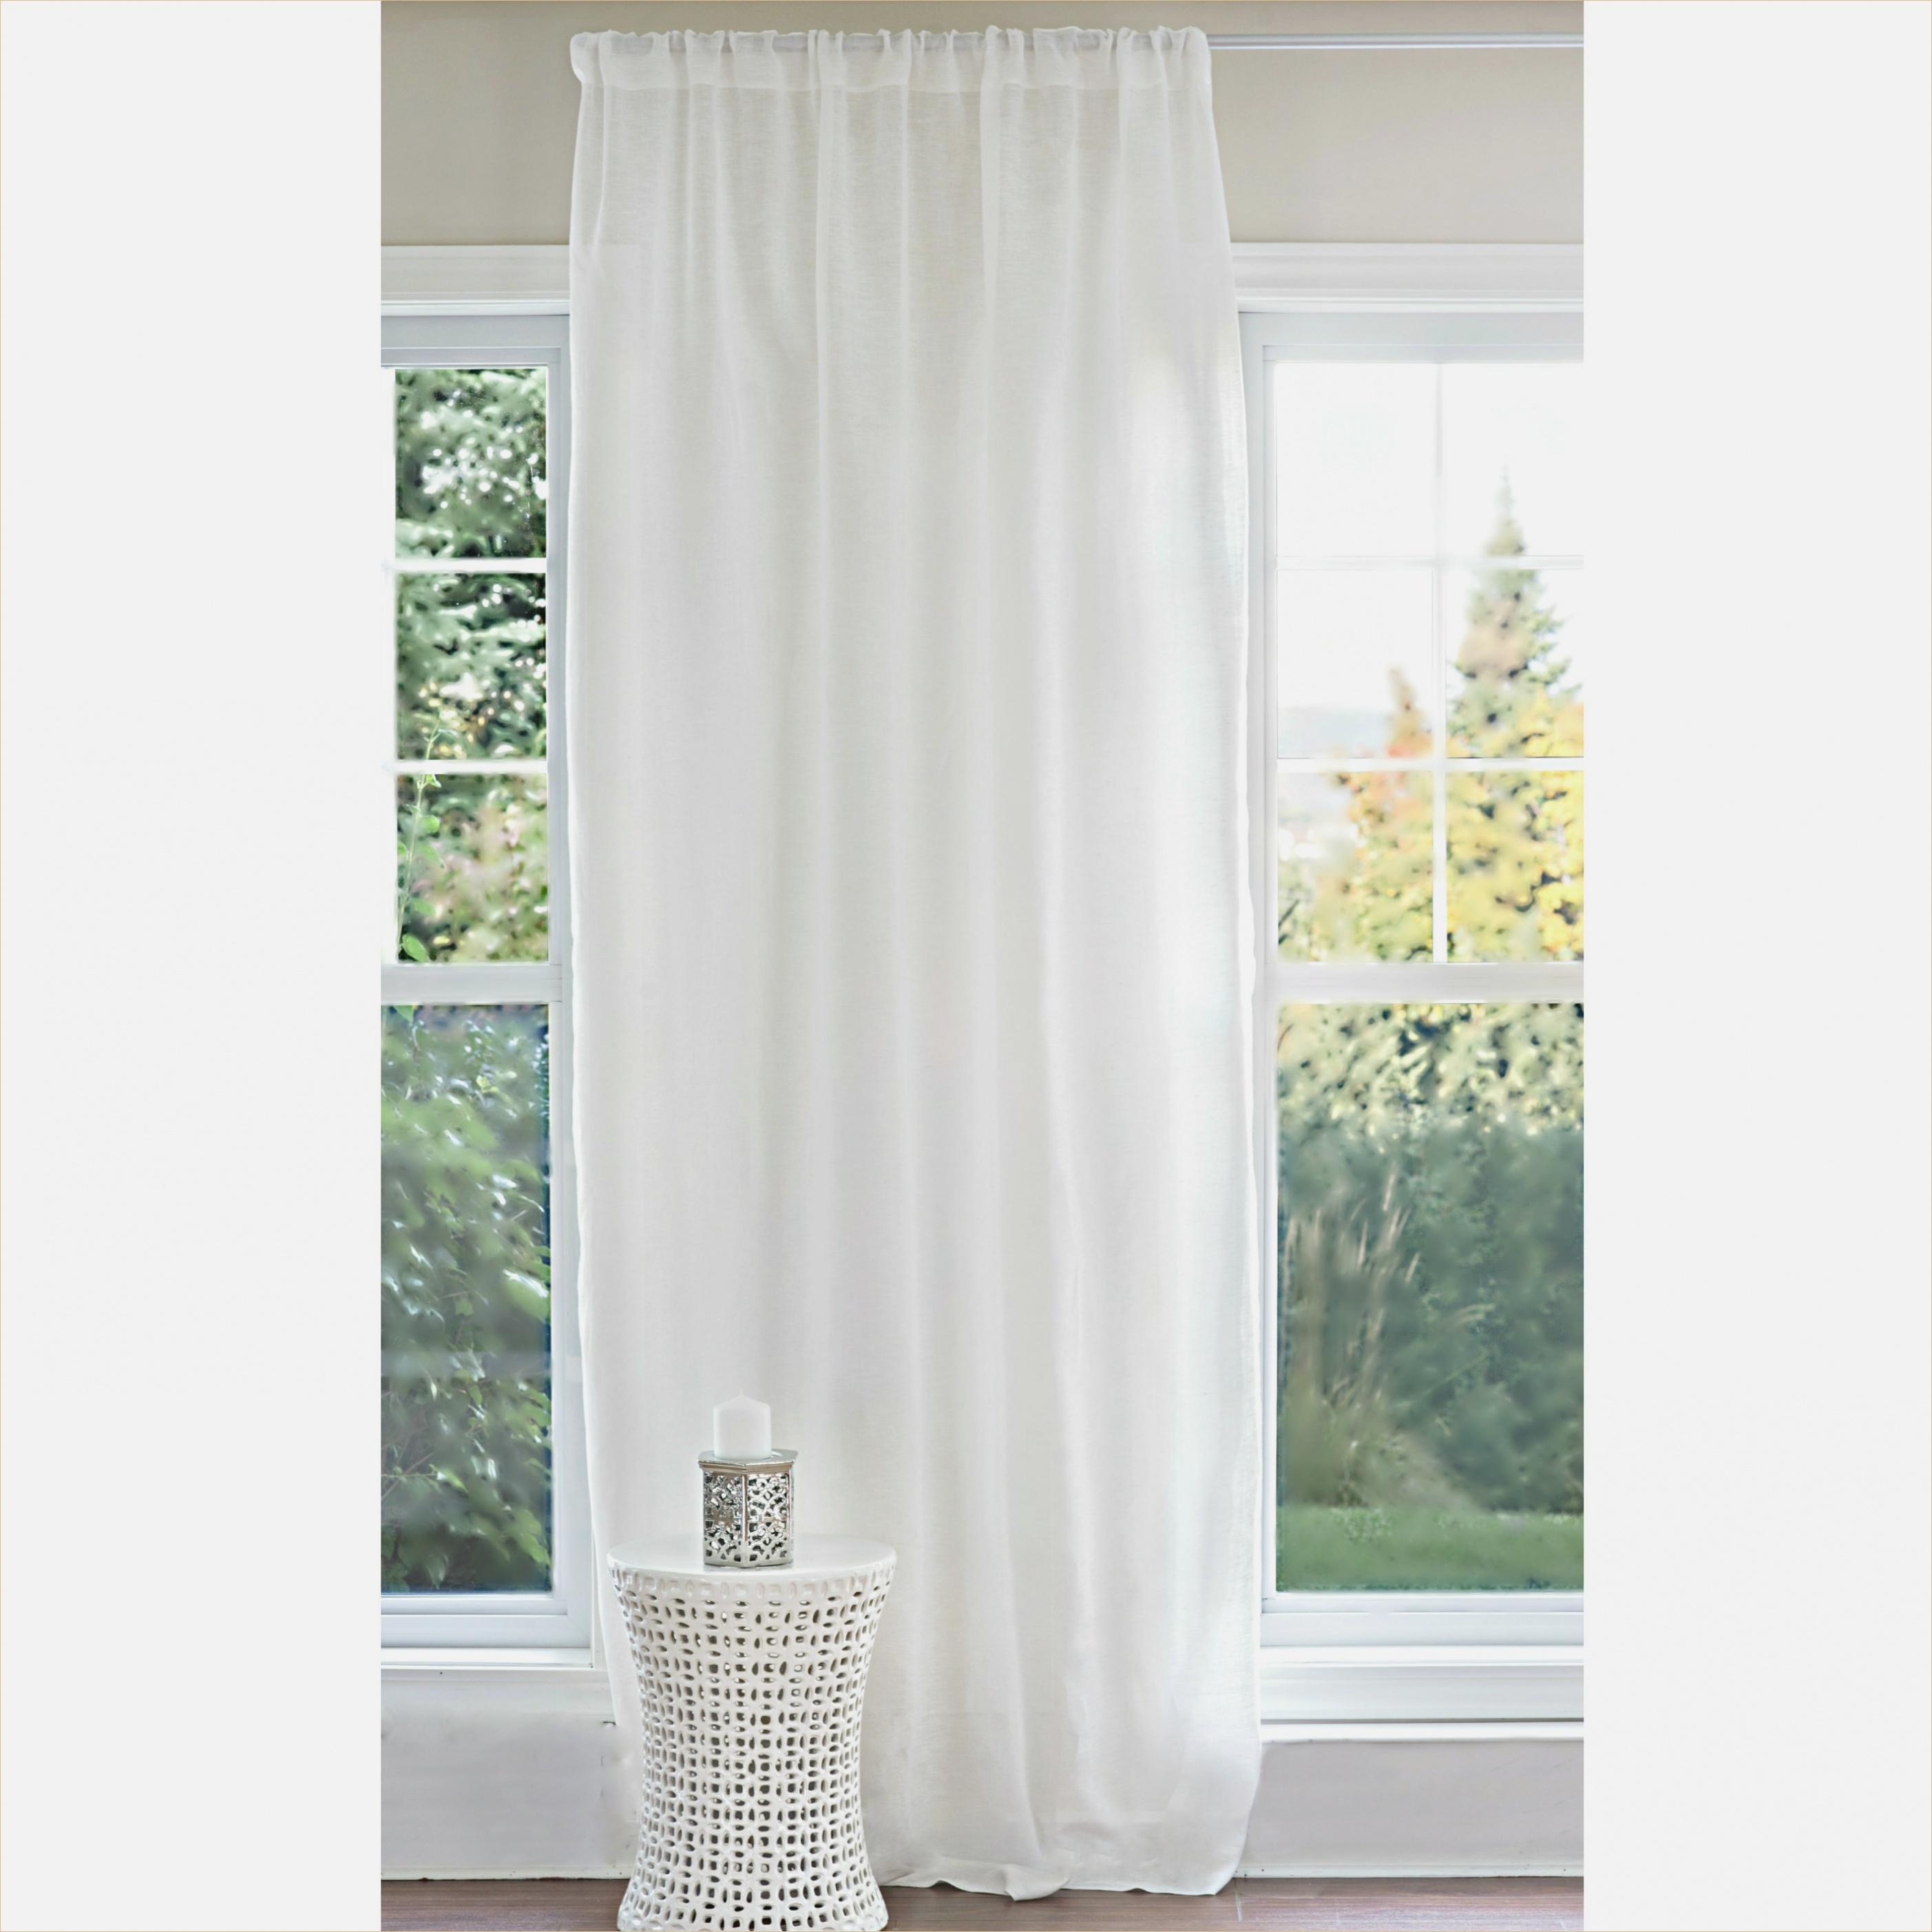 Brise Bise Ikea Élégant Collection Maha Di White Linen Curtain Inizio Mahagranda